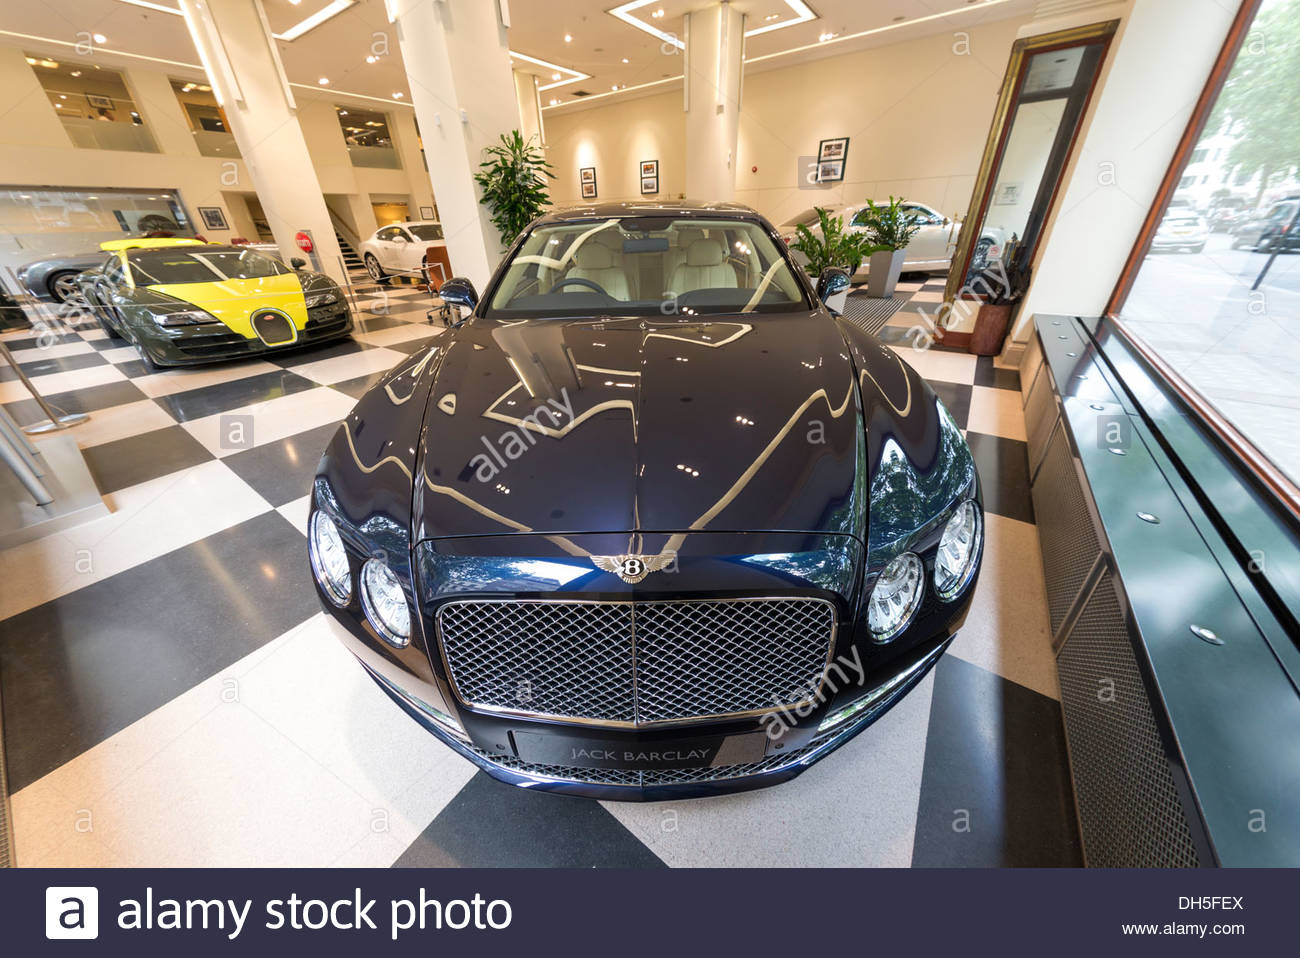 Jack Barclay Bentley Autohaus in Berkeley Square, Mayfair, London, England, UK Stockbild